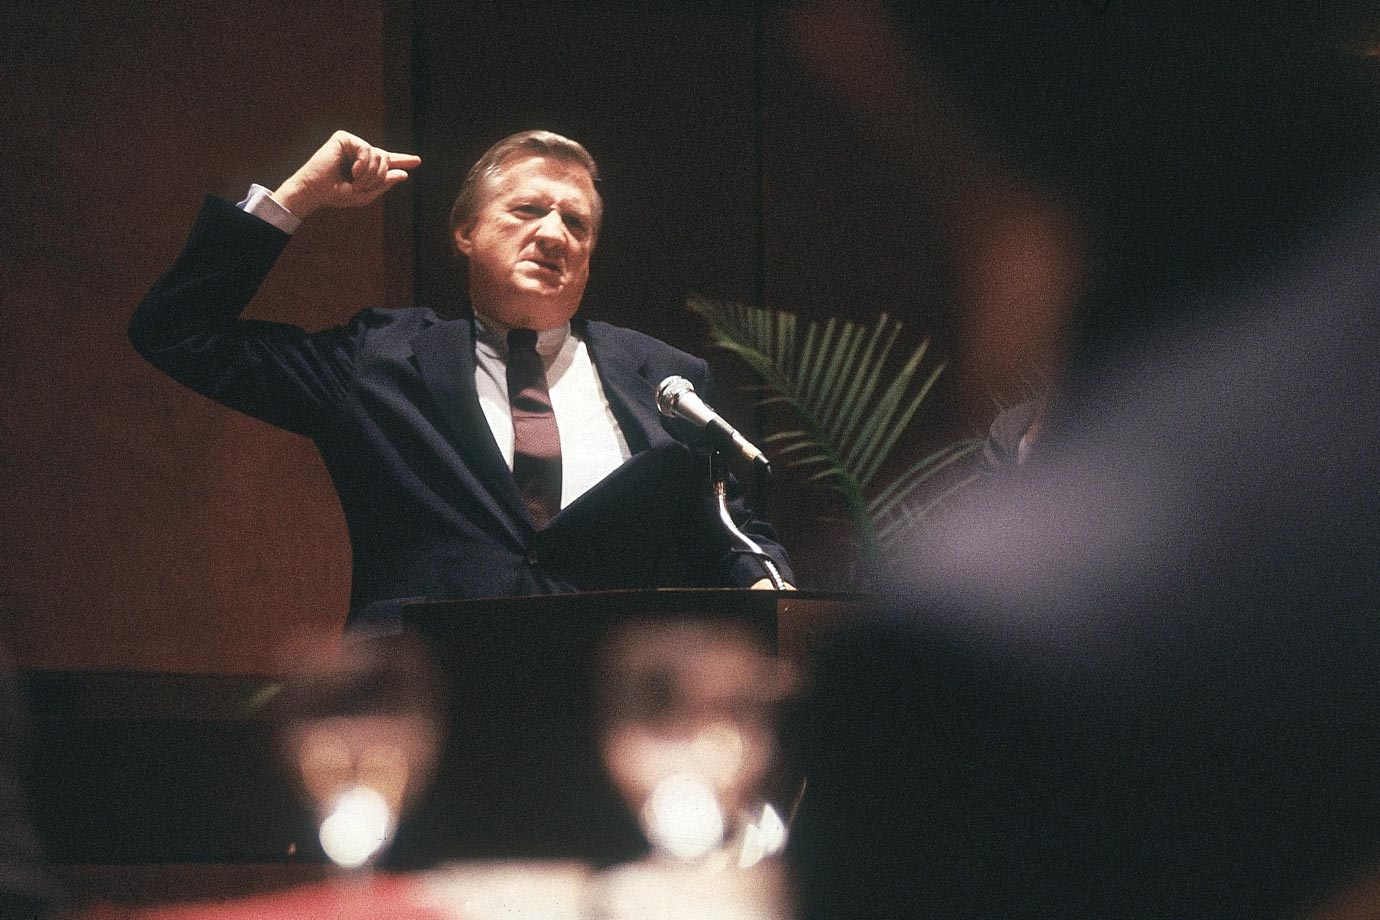 George Steinbrenner speaks at an ABA Breakfast on April 27, 1990 in New York City.